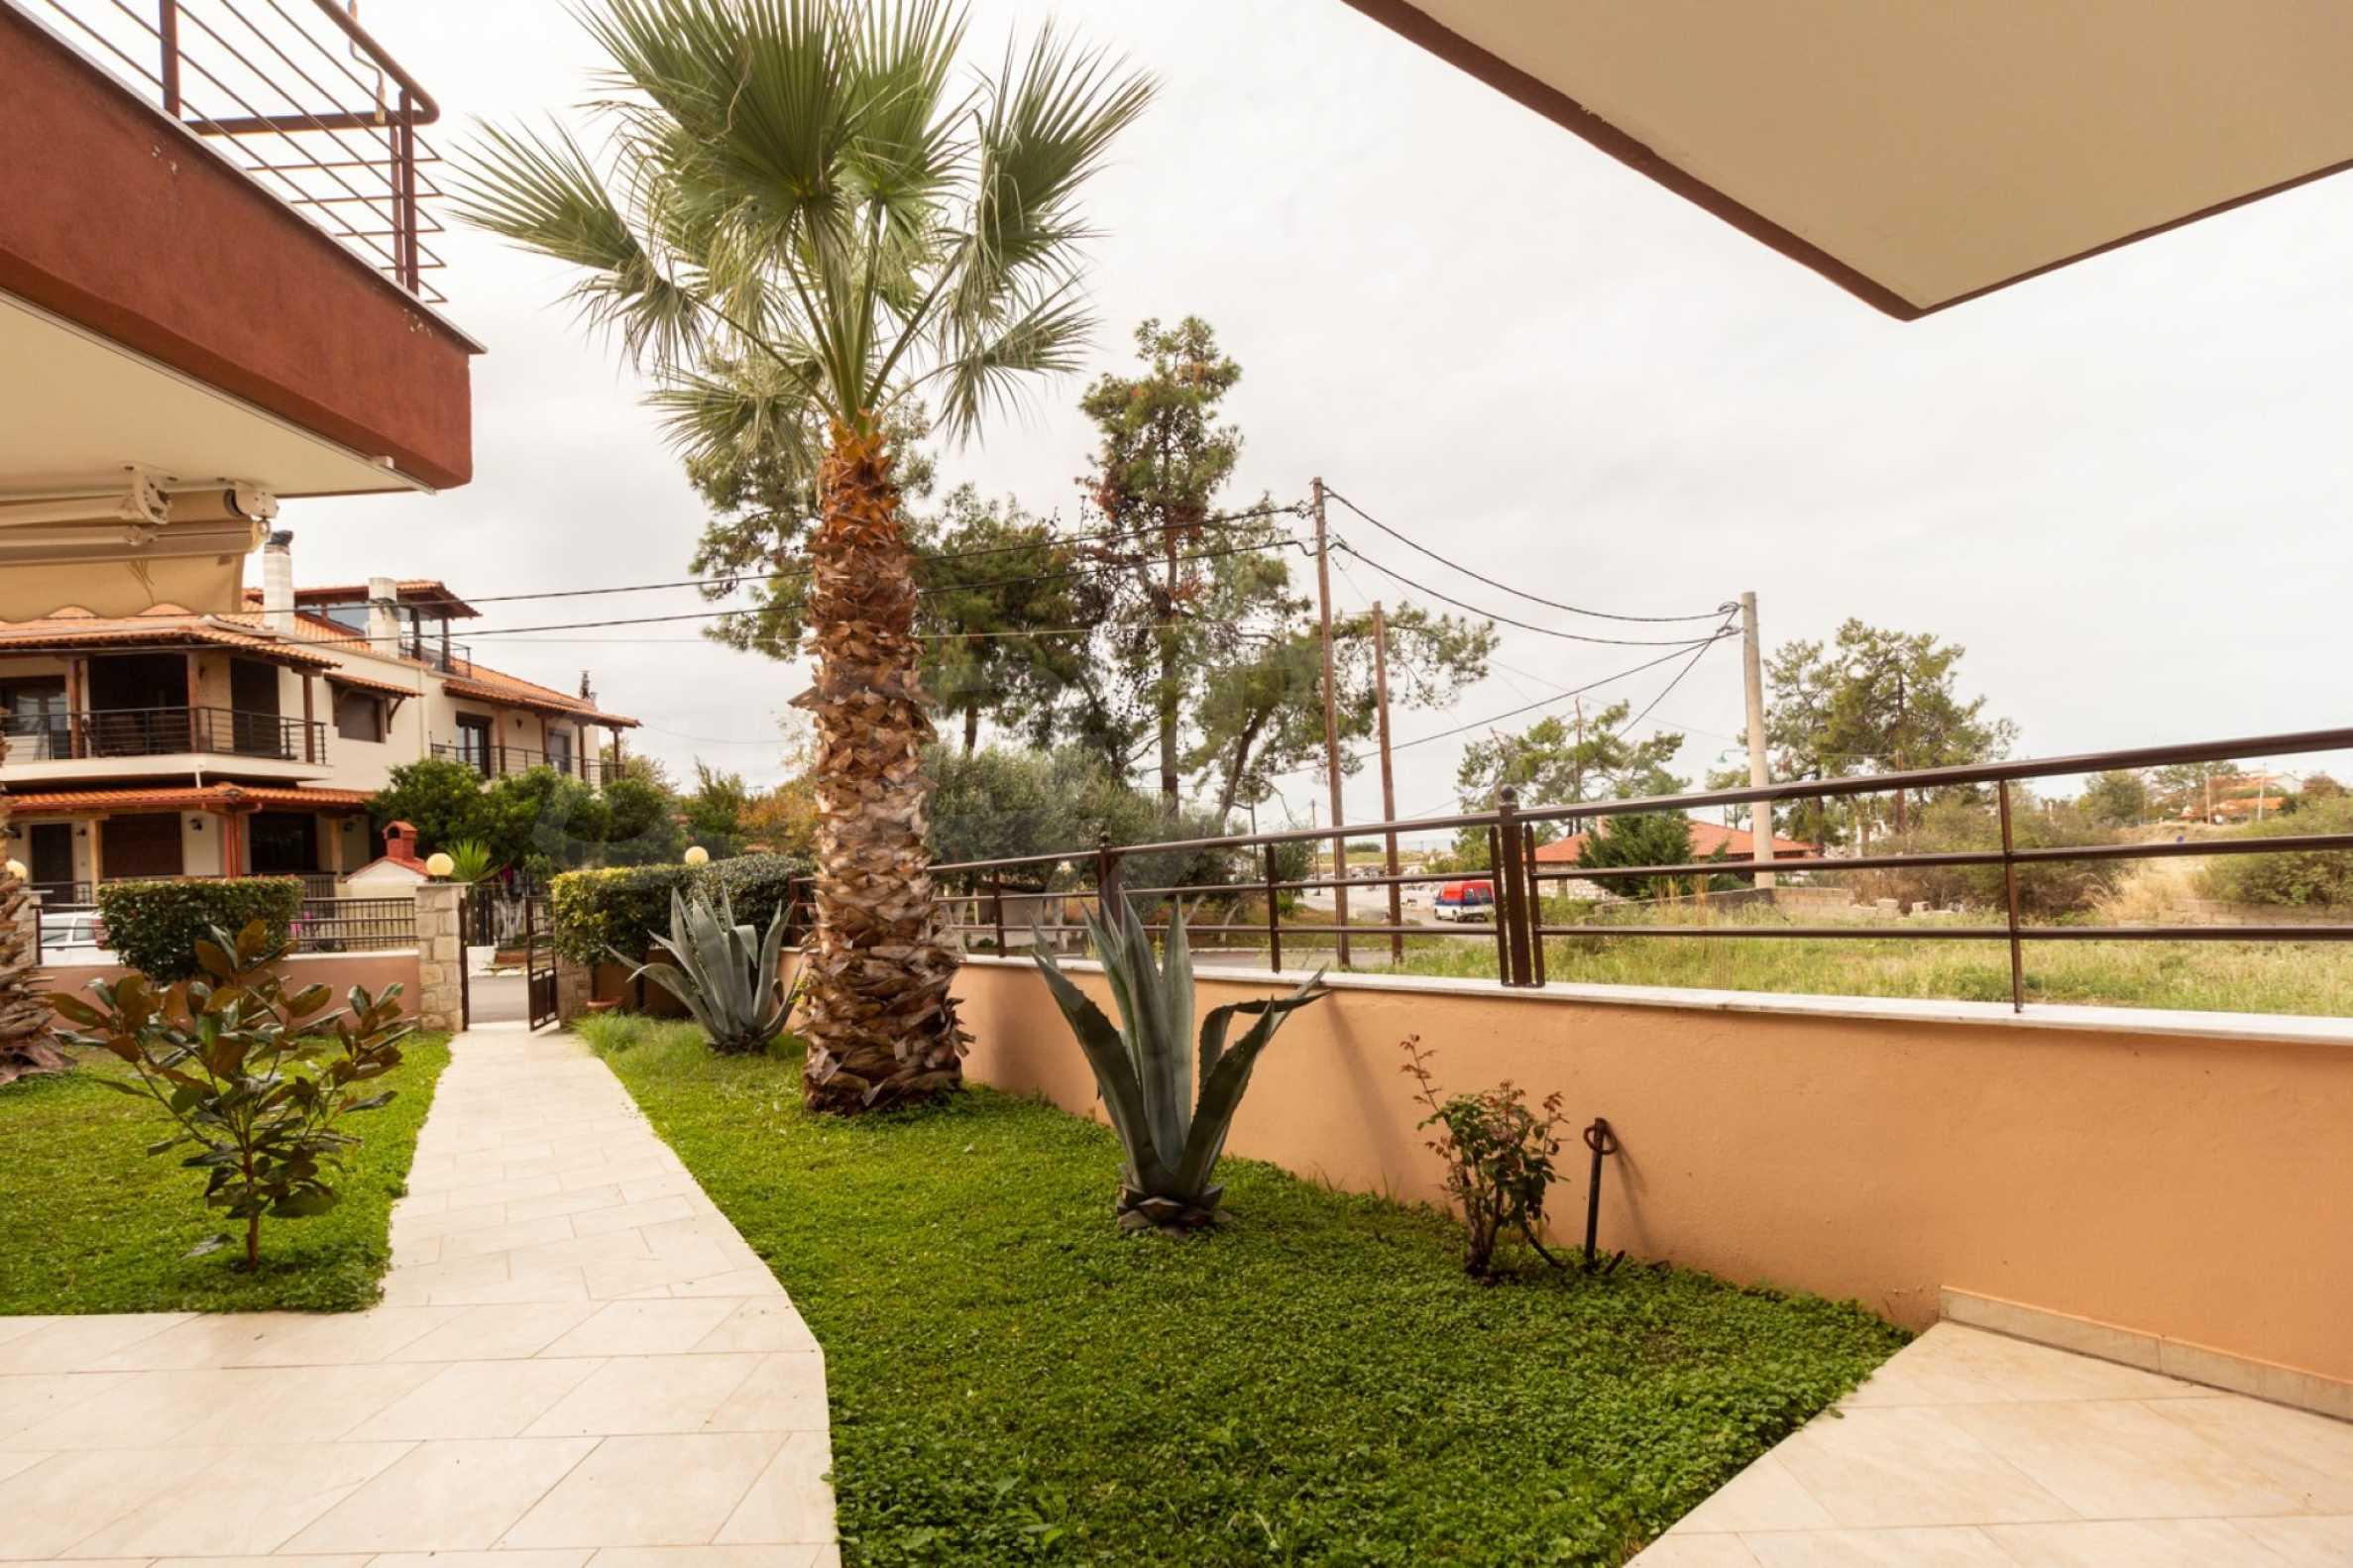 тристаен апартамент в Потидея, Касандра 16